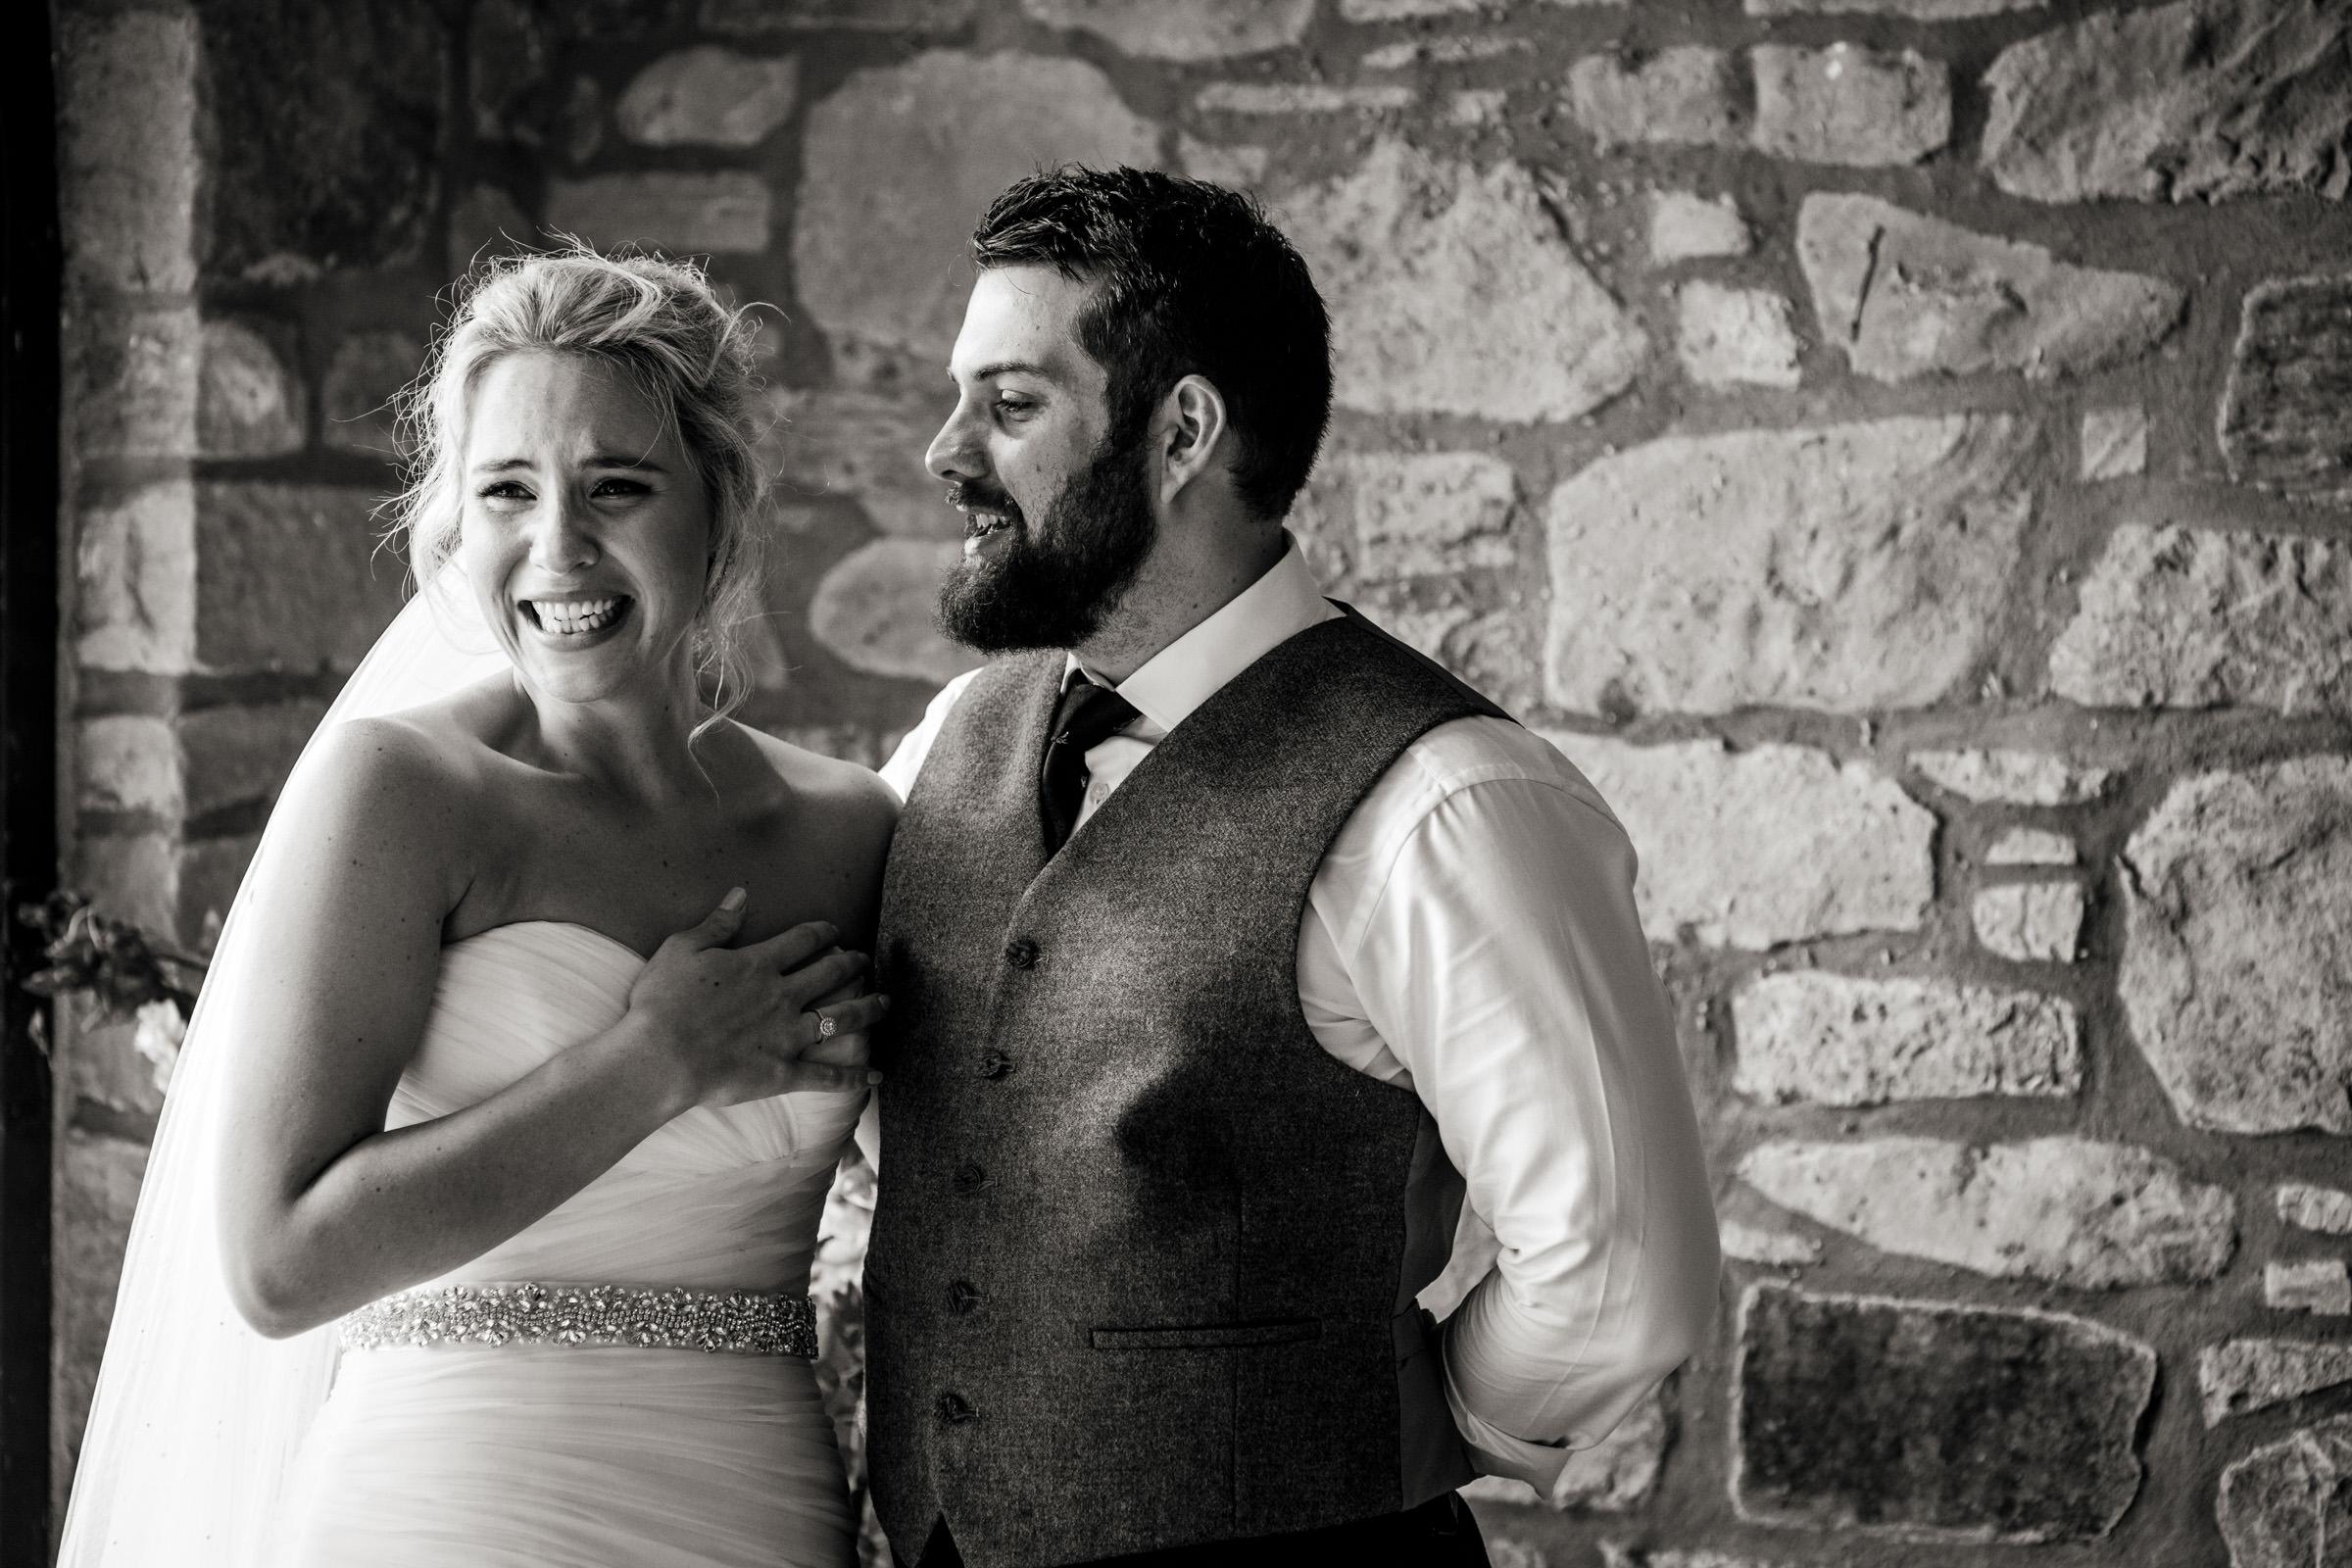 Documentart wedding photographers Berwick-upon-Tweed 009.jpg